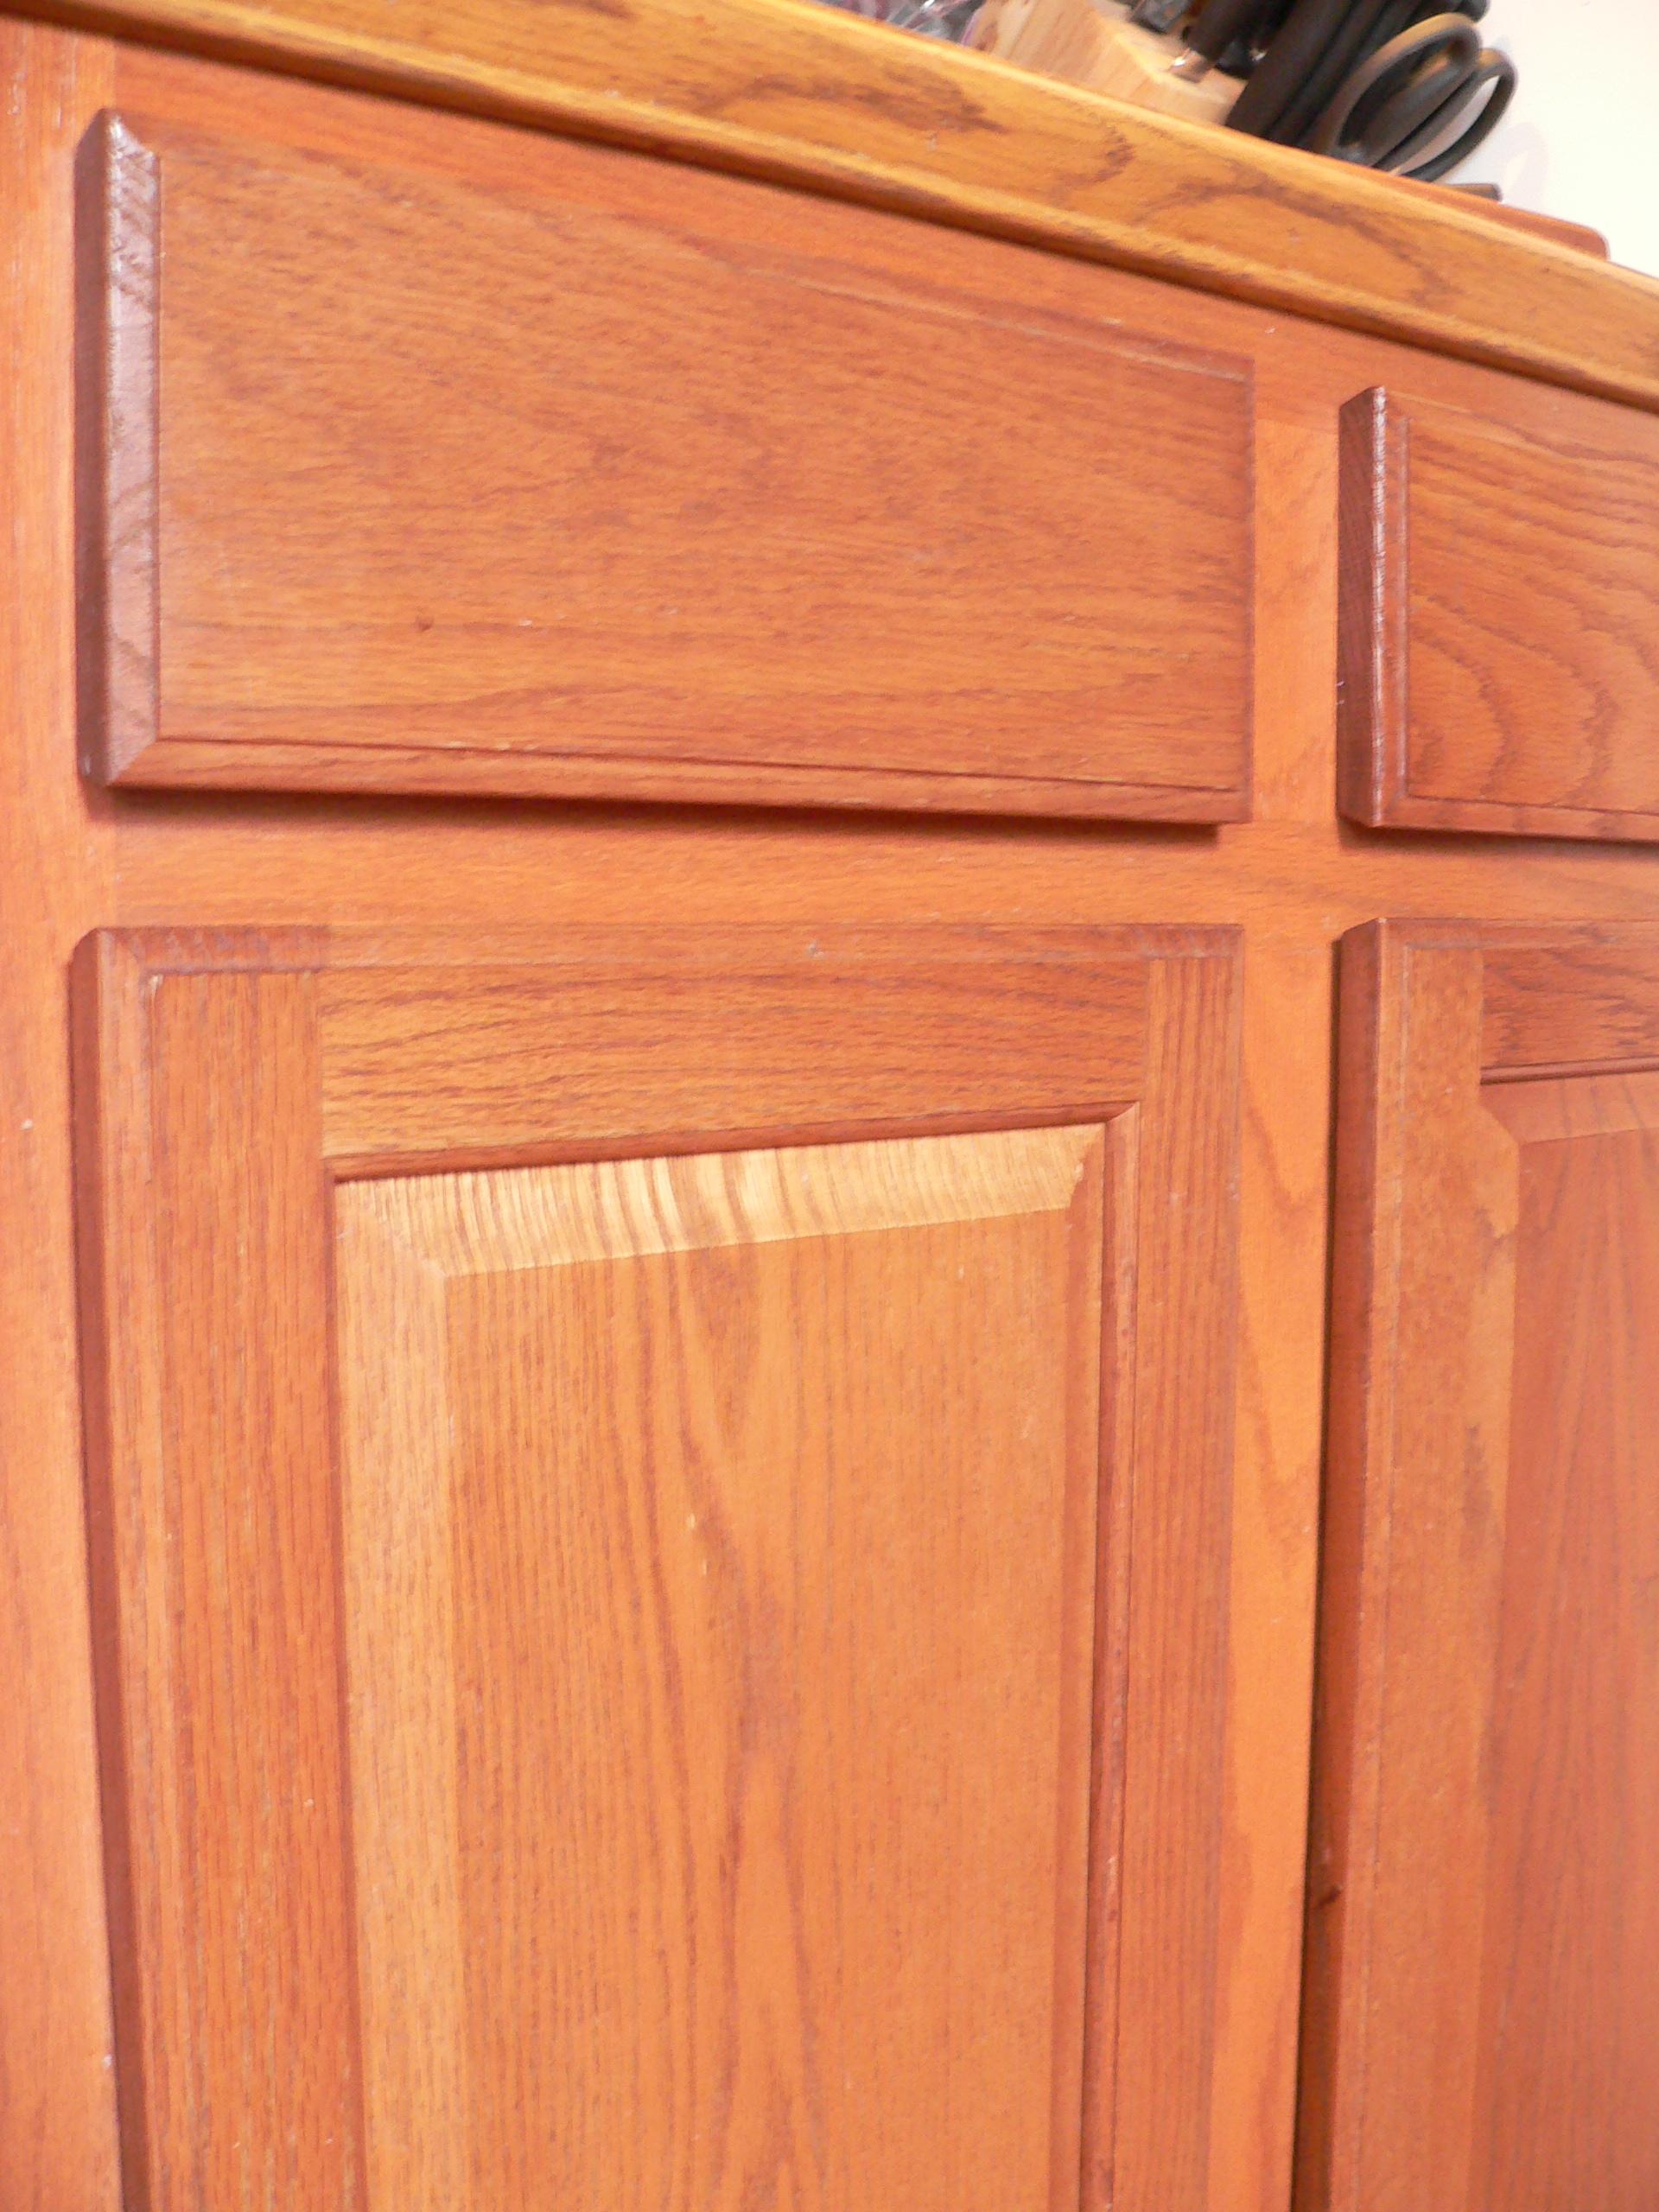 cabinet face frame construction  Home Decor